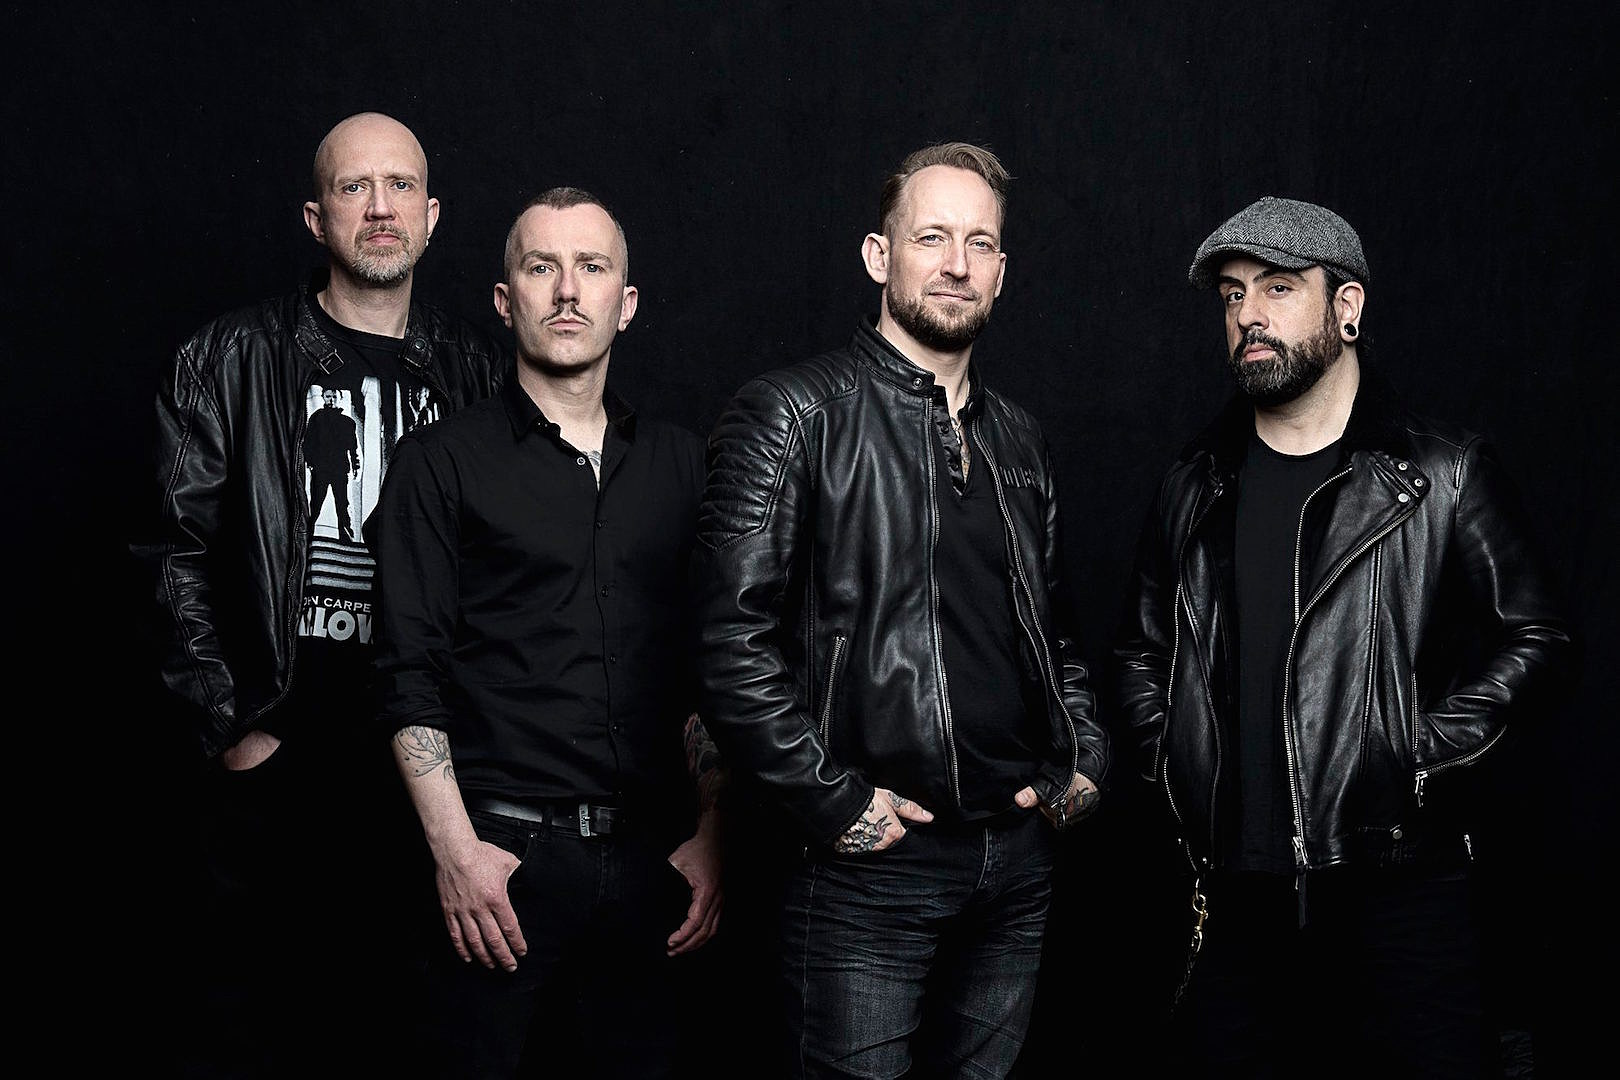 Volbeat Shine Light on 'Last Day Under the Sun' Video